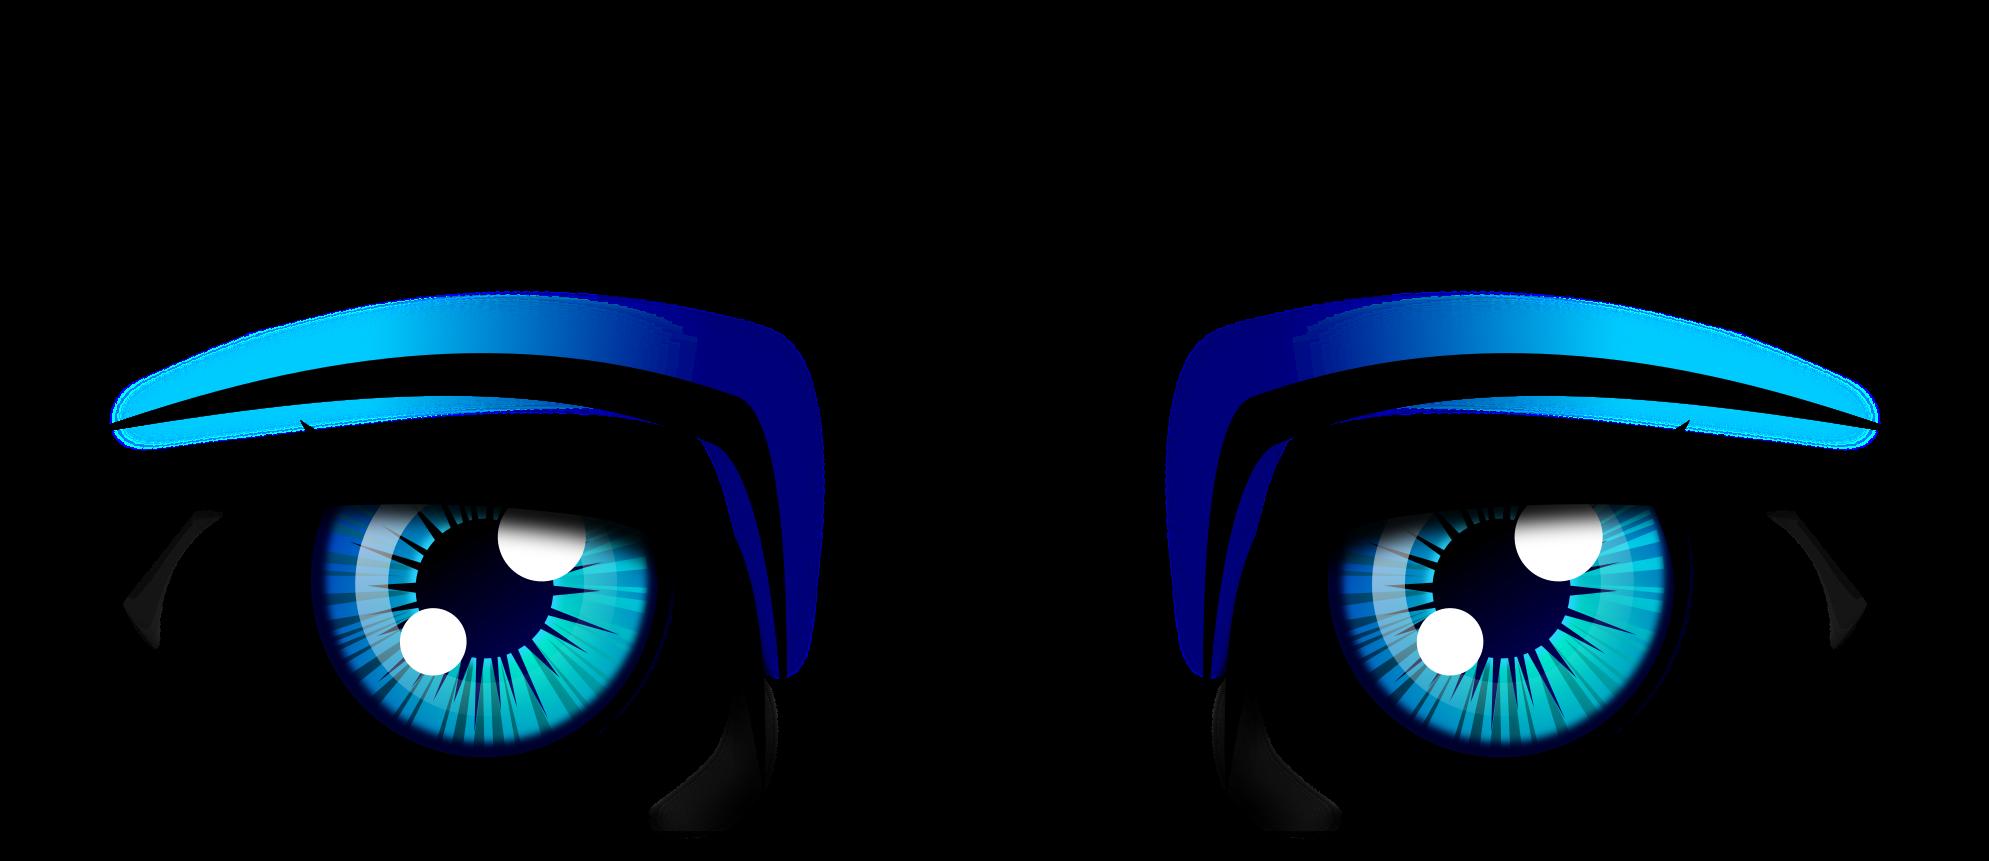 Boyaus eyes png download. Eyebrow clipart blue eye